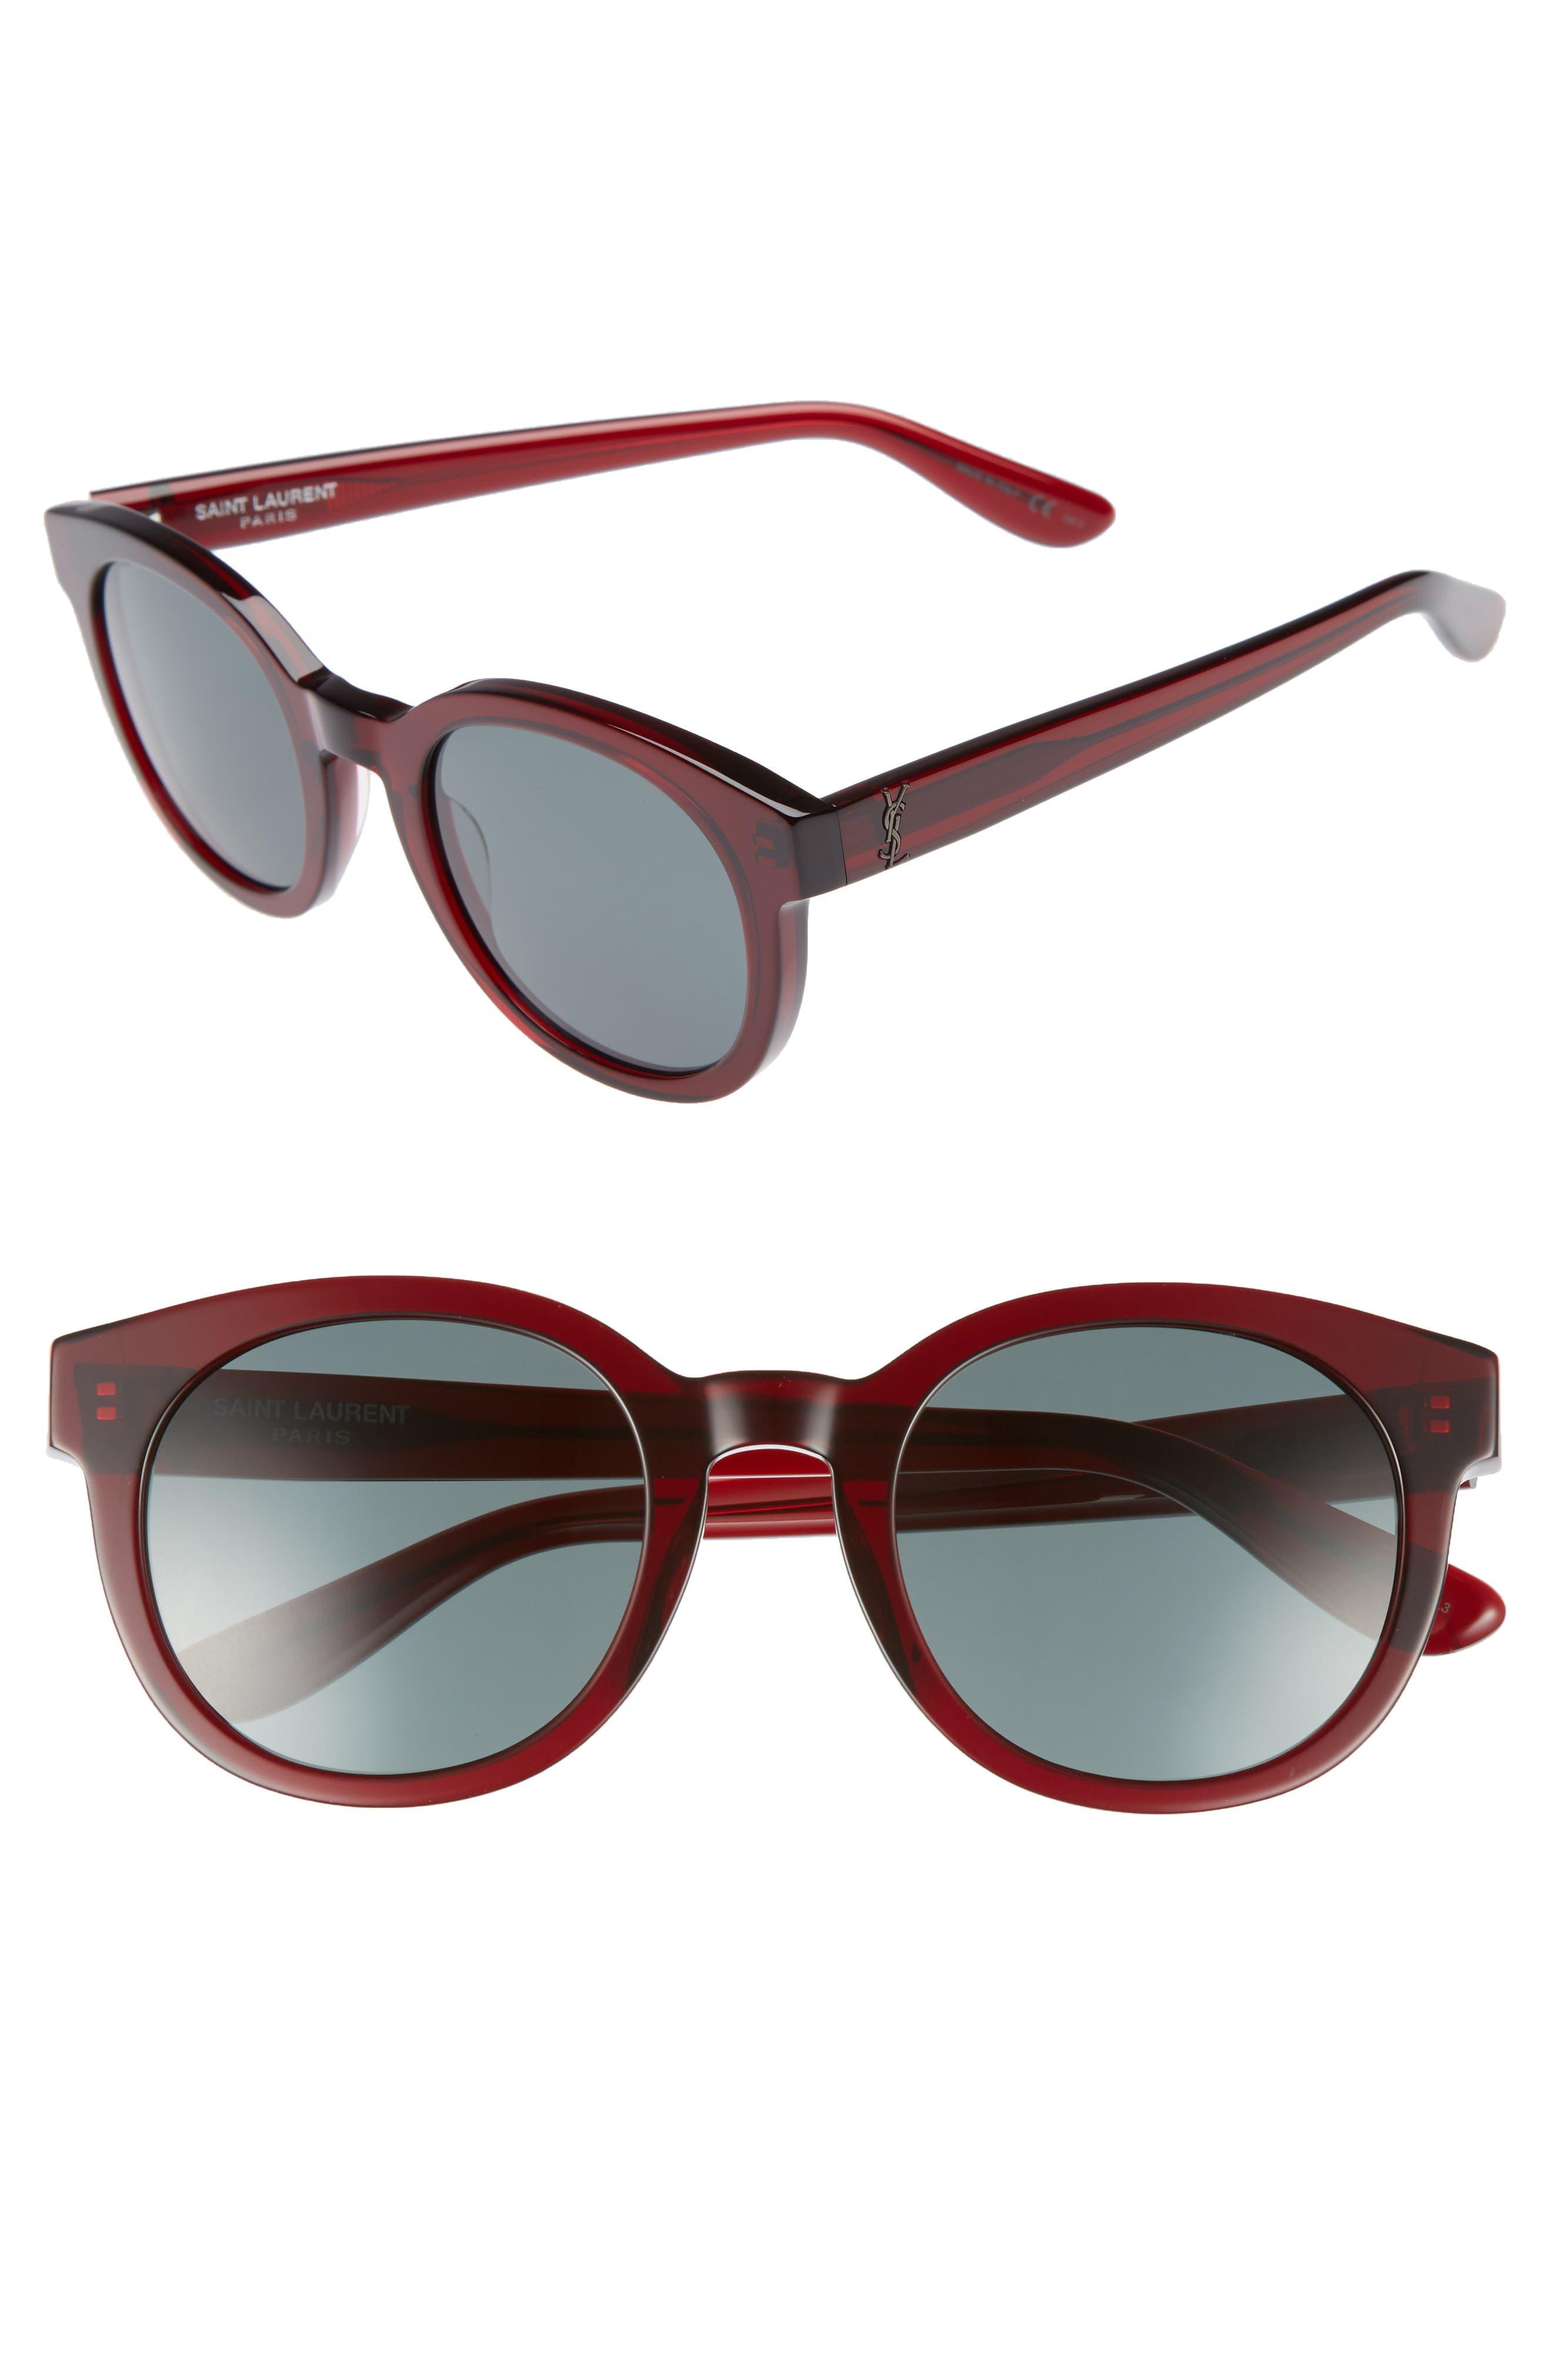 51mm Round Sunglasses,                             Main thumbnail 1, color,                             600